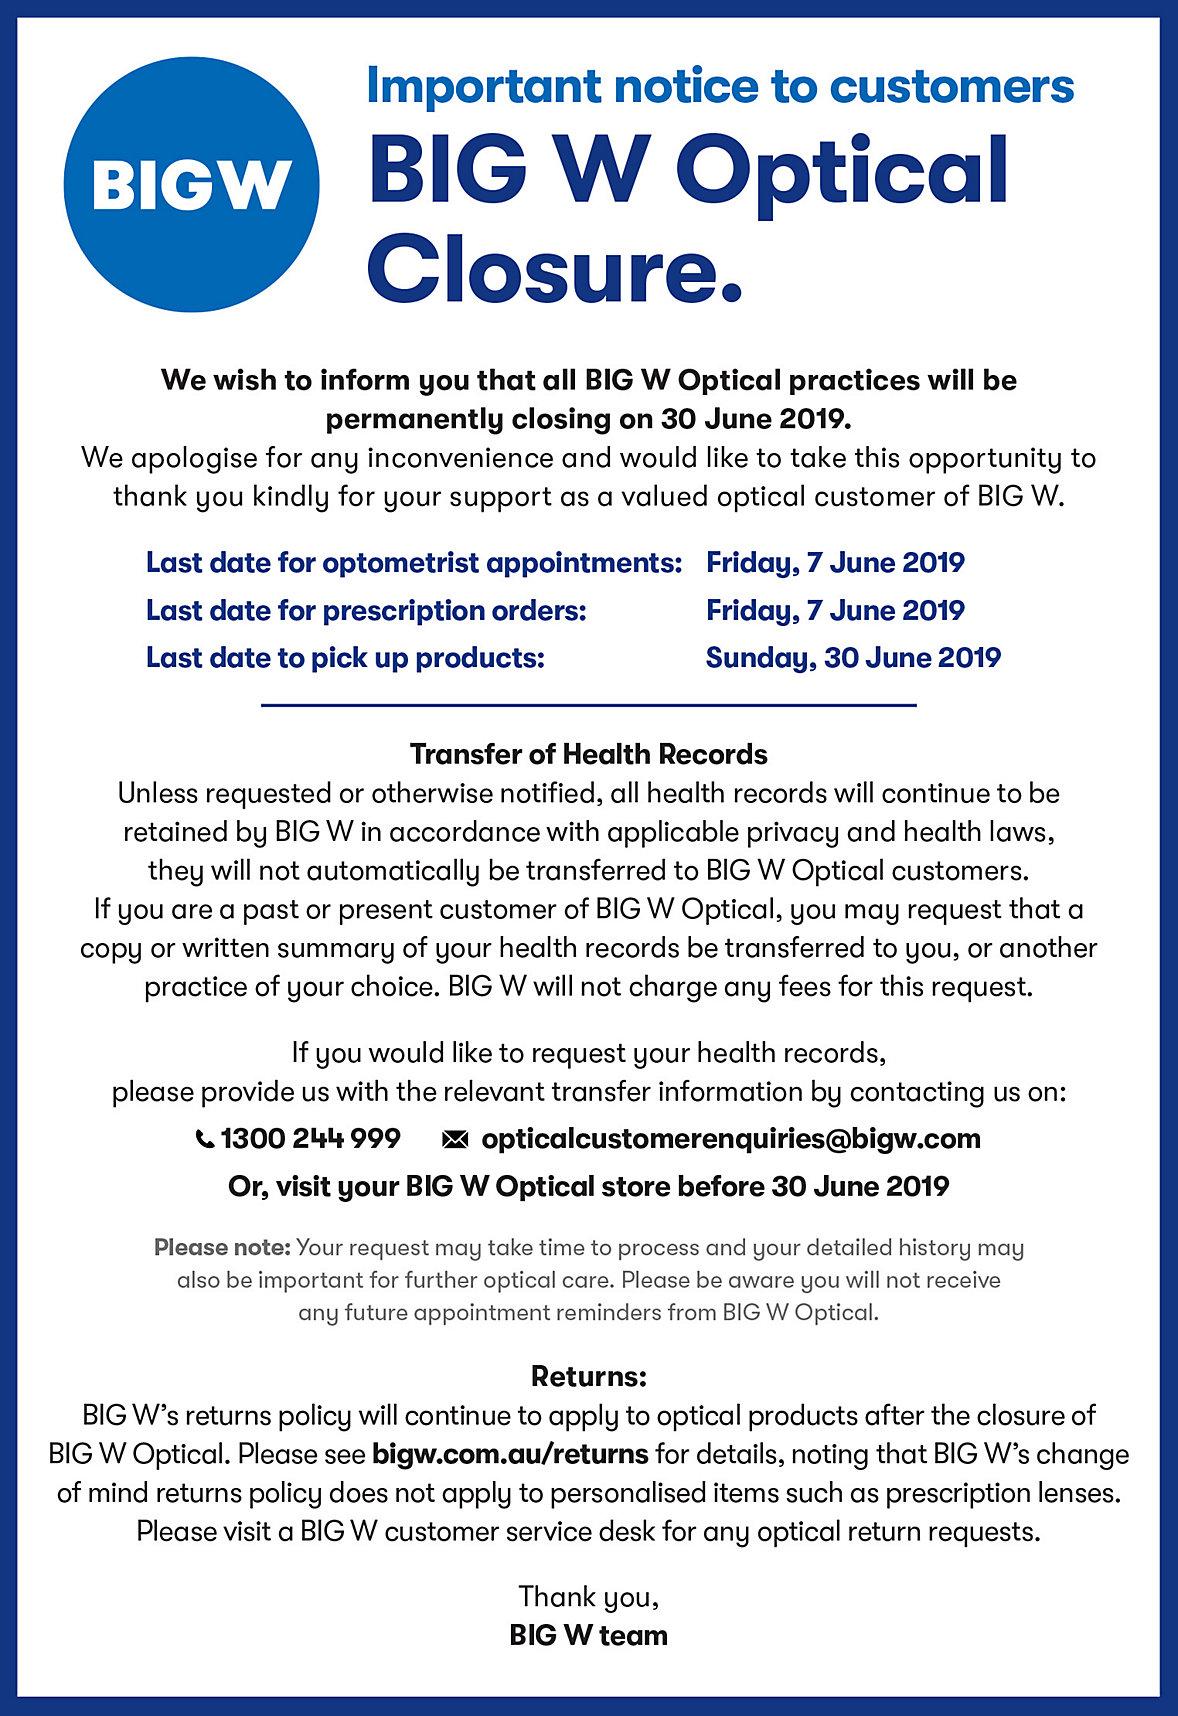 BIG W Optical Closure Notice